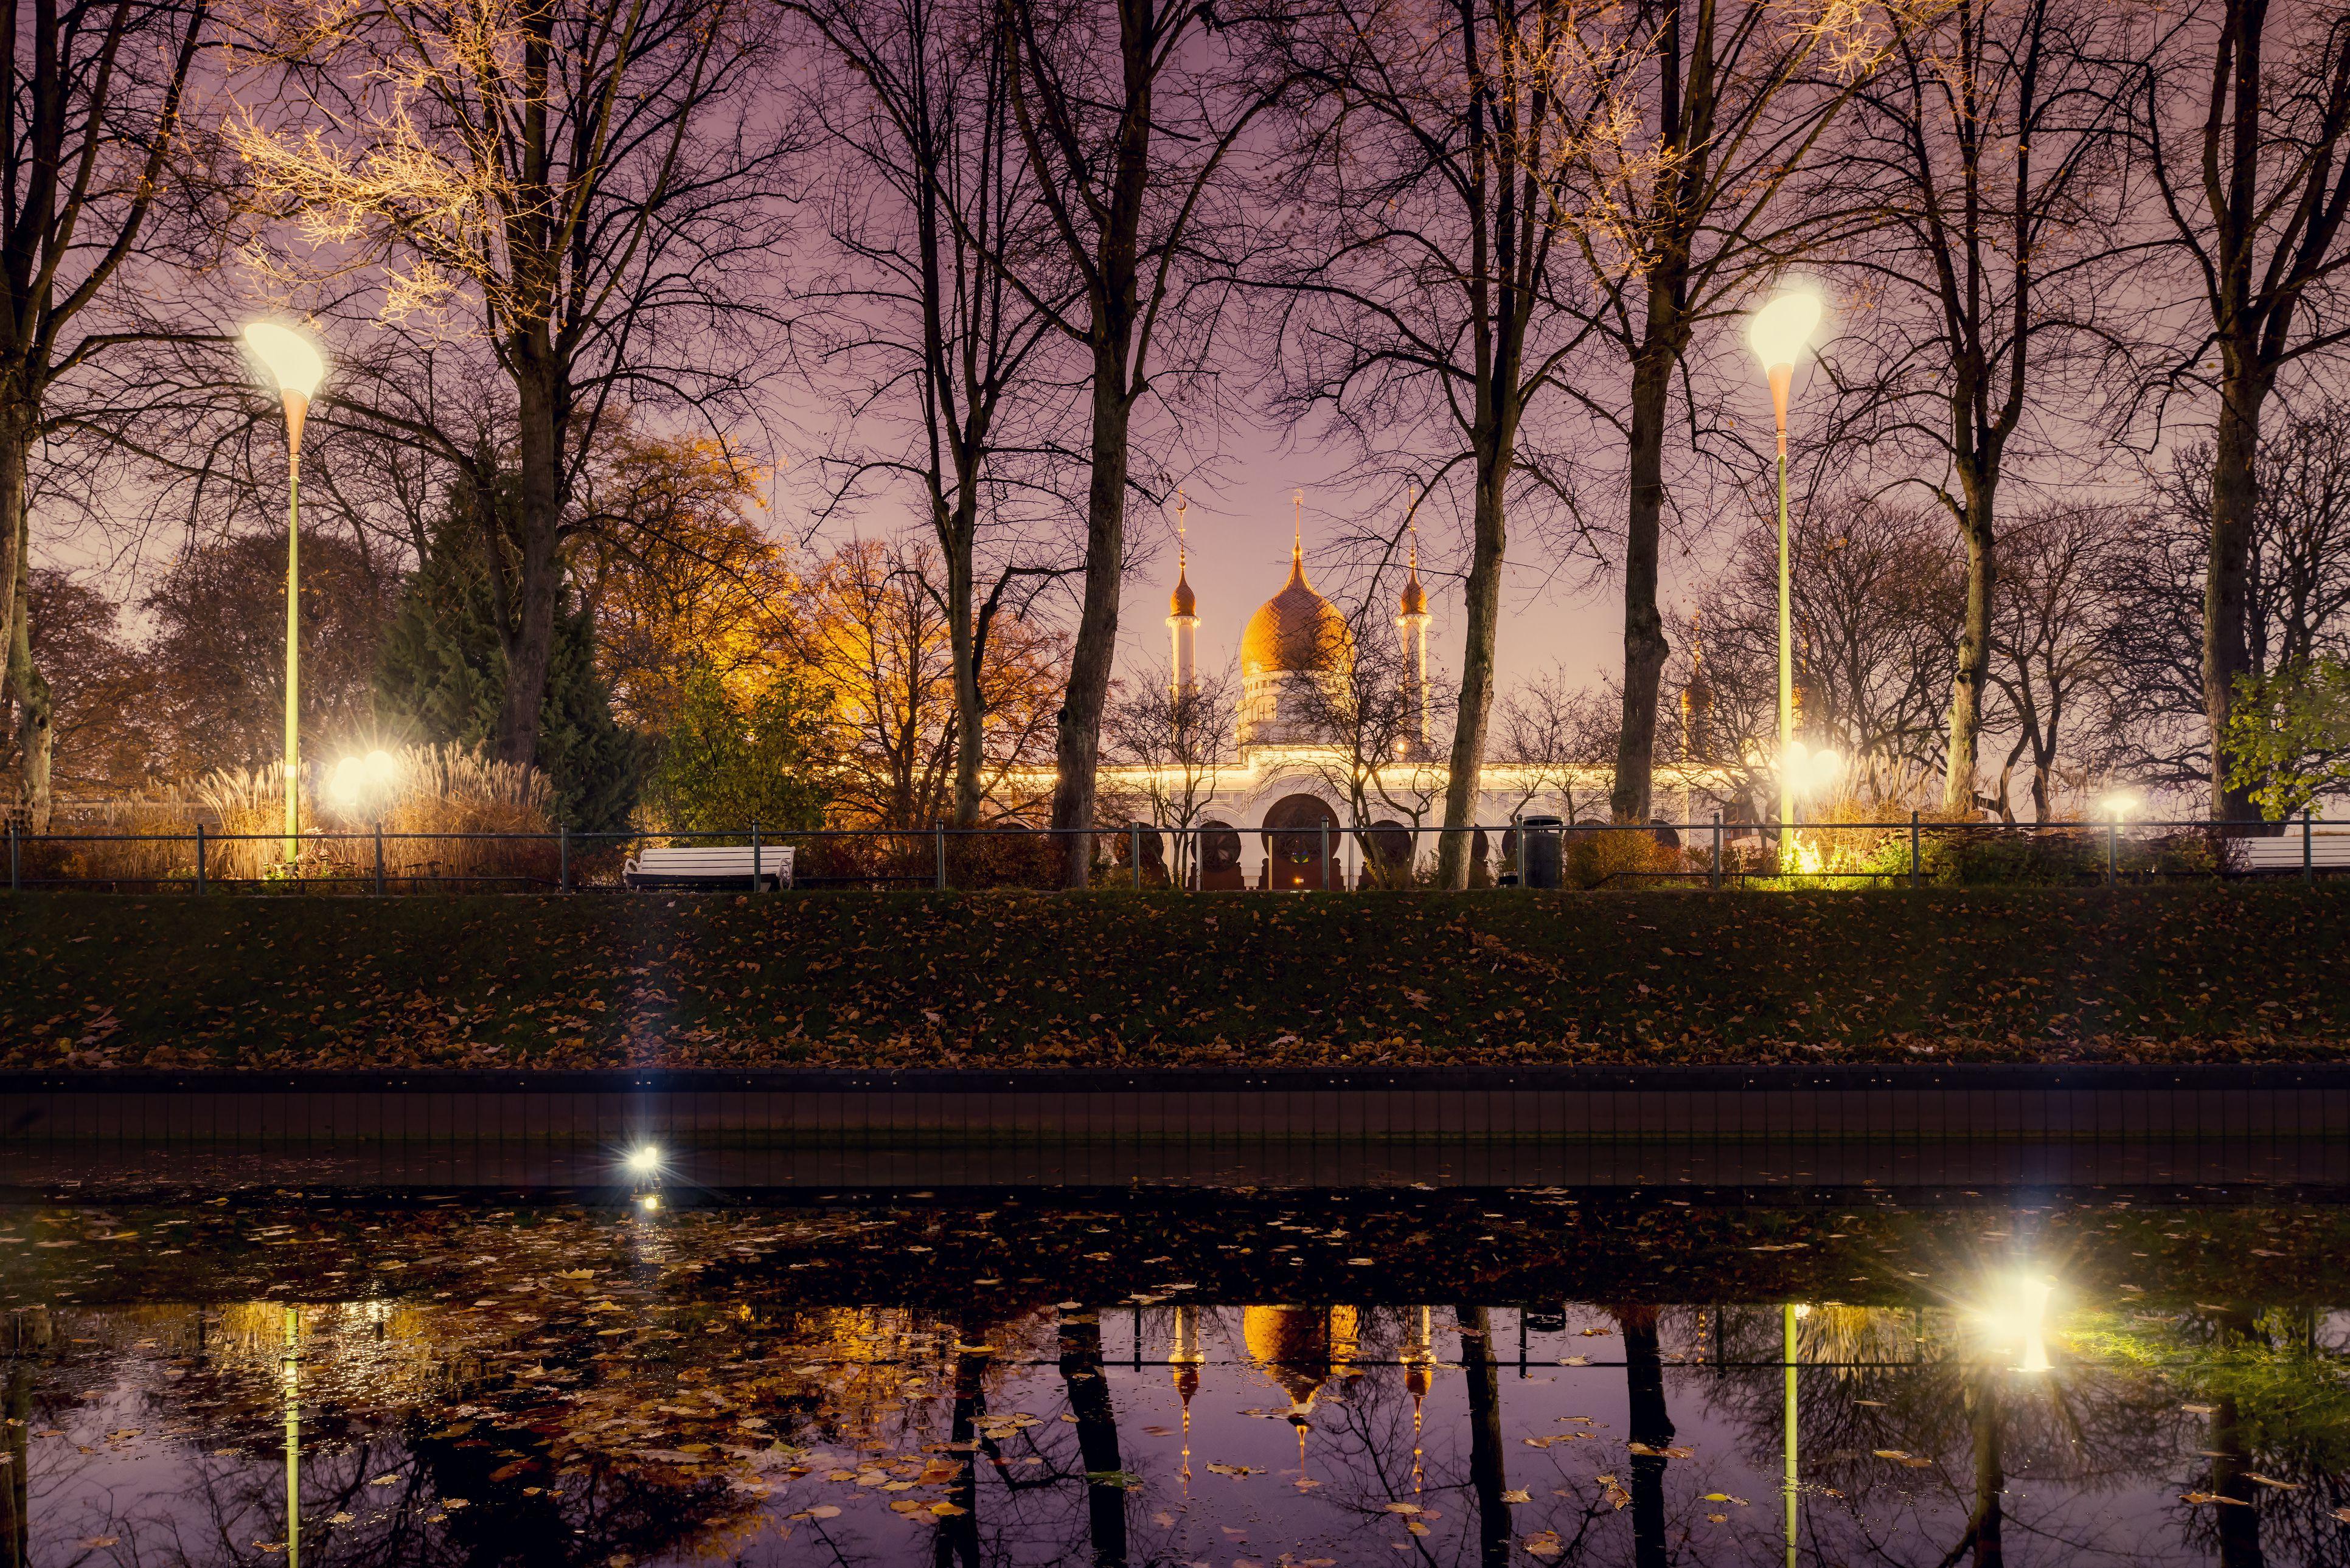 'Sweden, Skane, Malmo, Moriska Paviljongen or Morrish Pavilion in Folkets park at night'